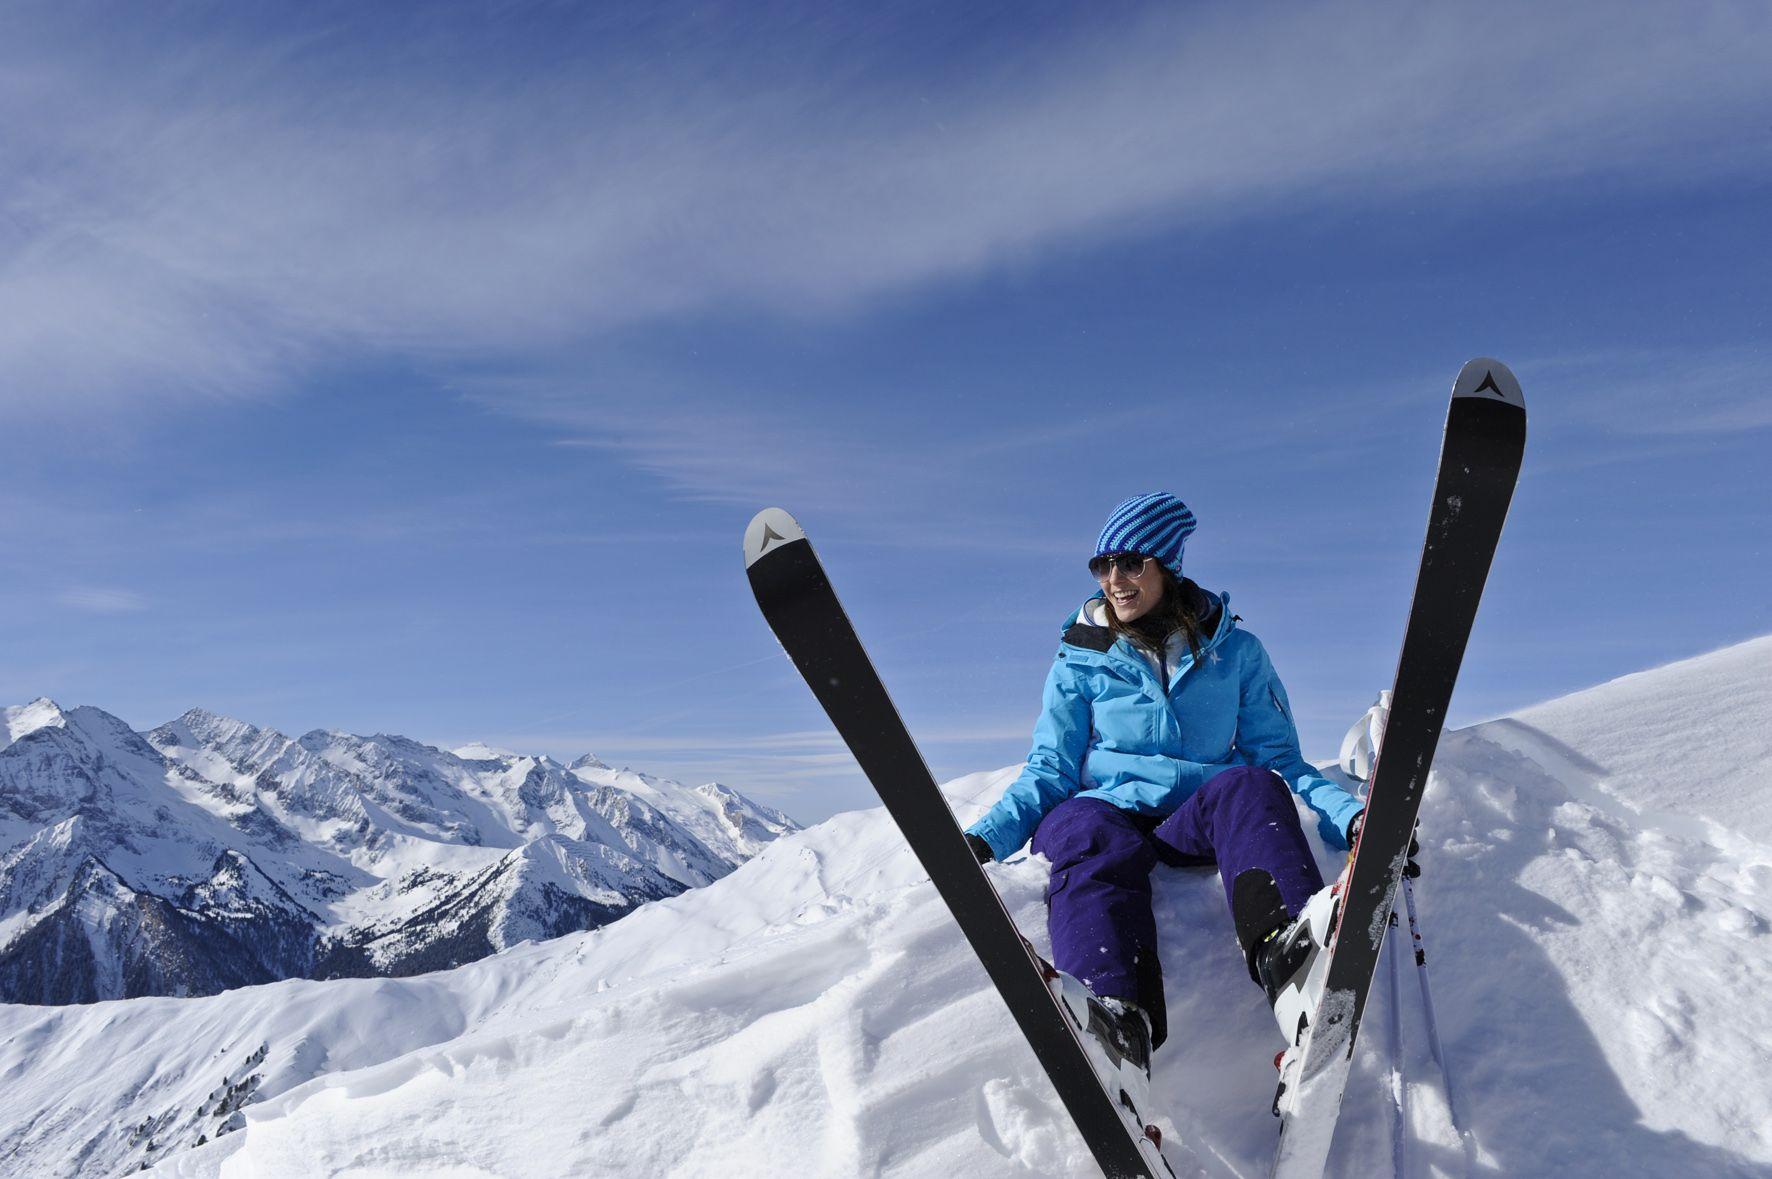 esqui,-descanso,-nieve-192386